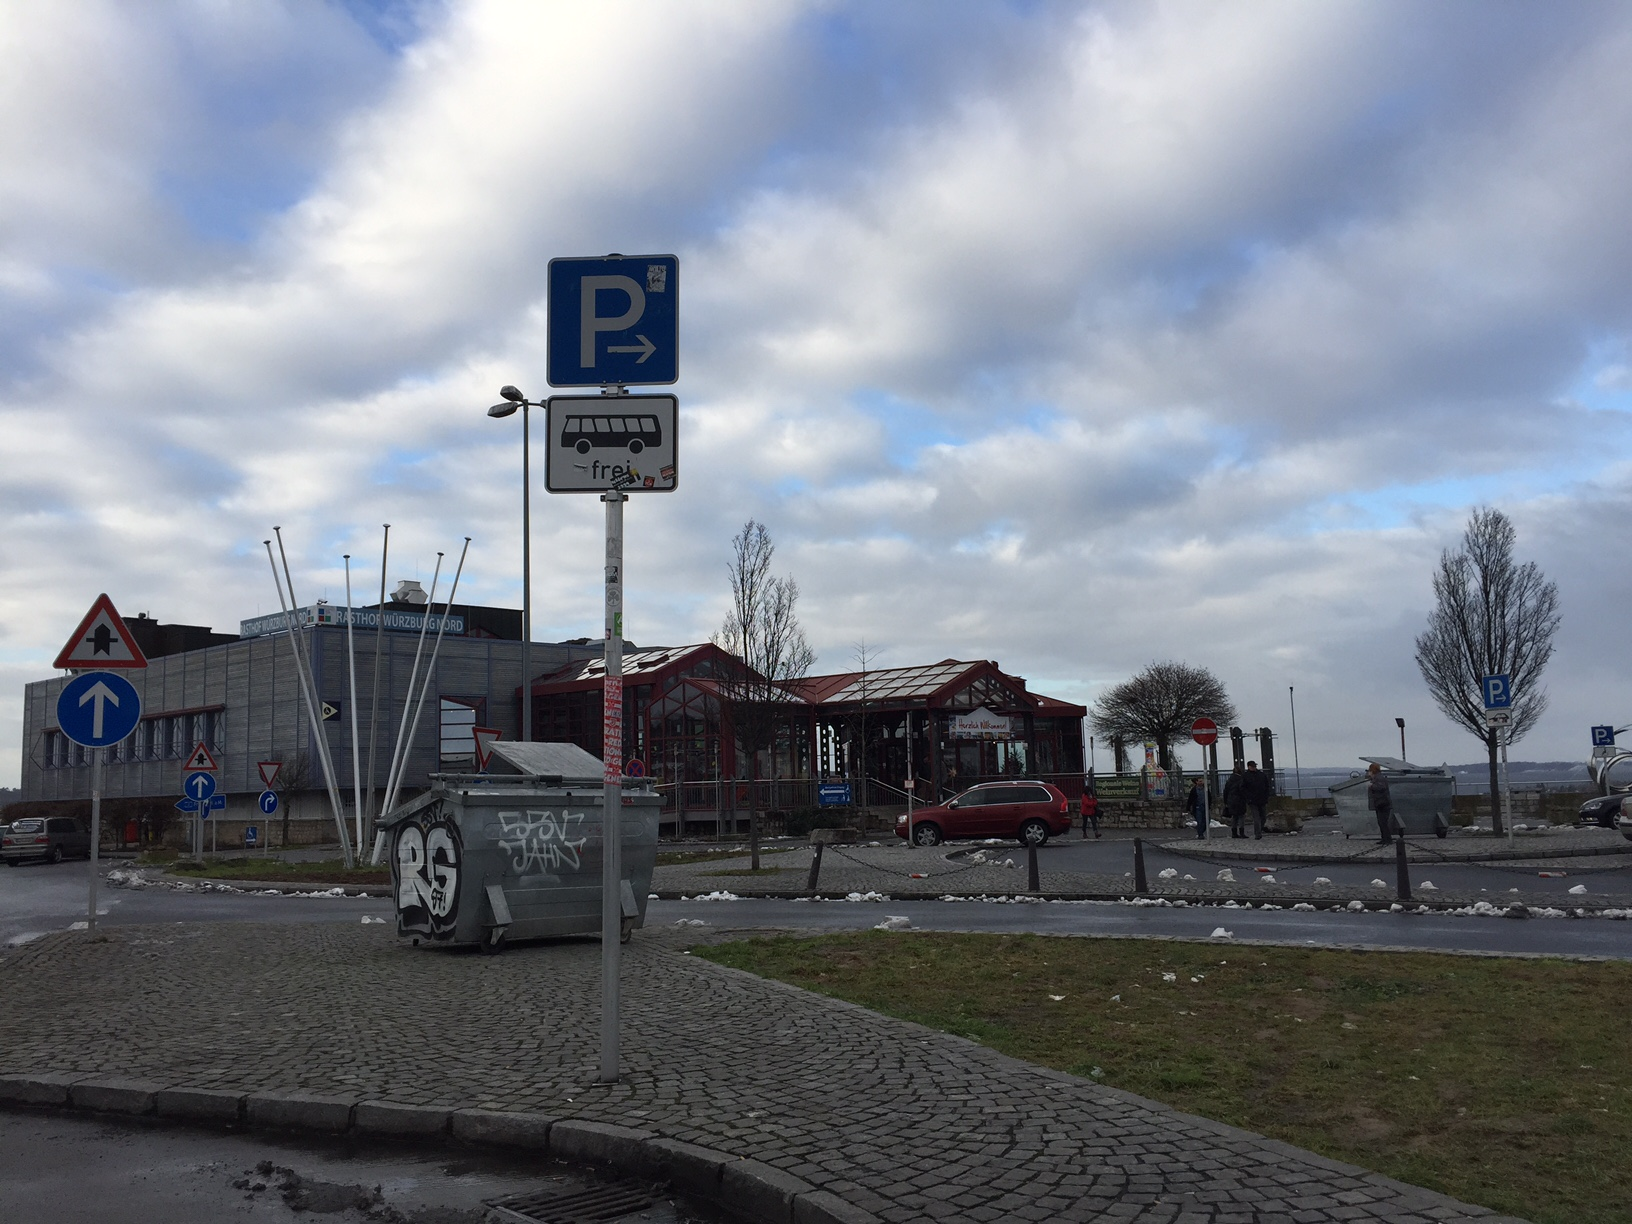 Kraftort Autobahnraststätte